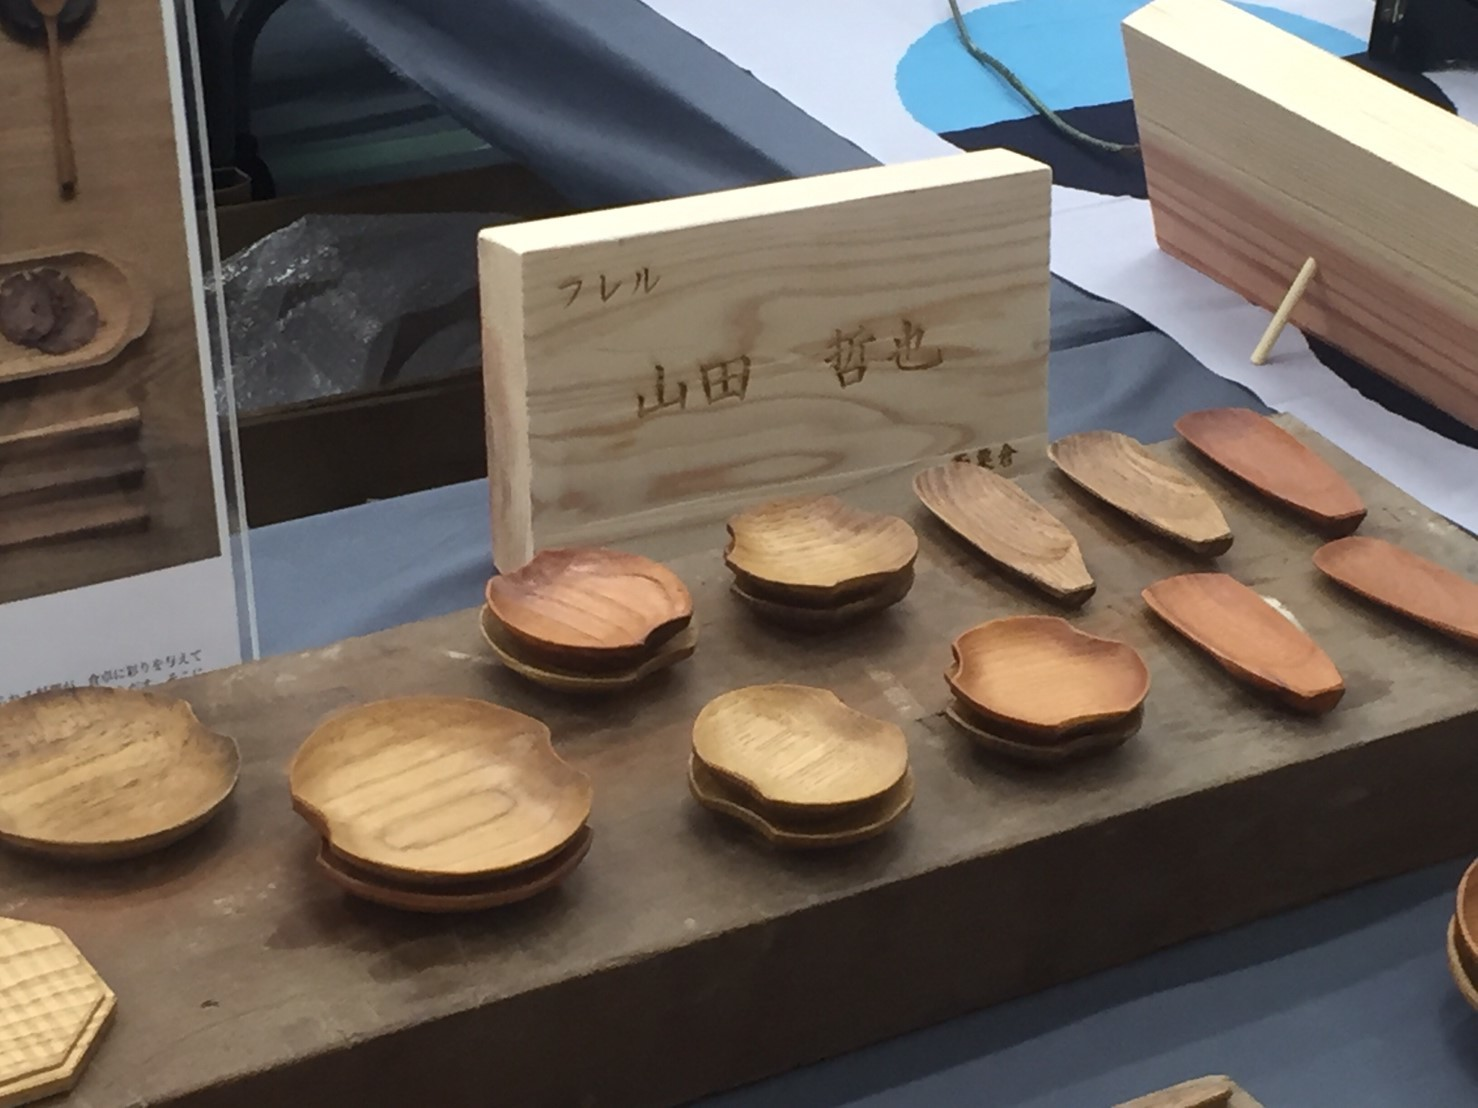 西郷工芸祭り・三滝渓_e0115904_15572841.jpg